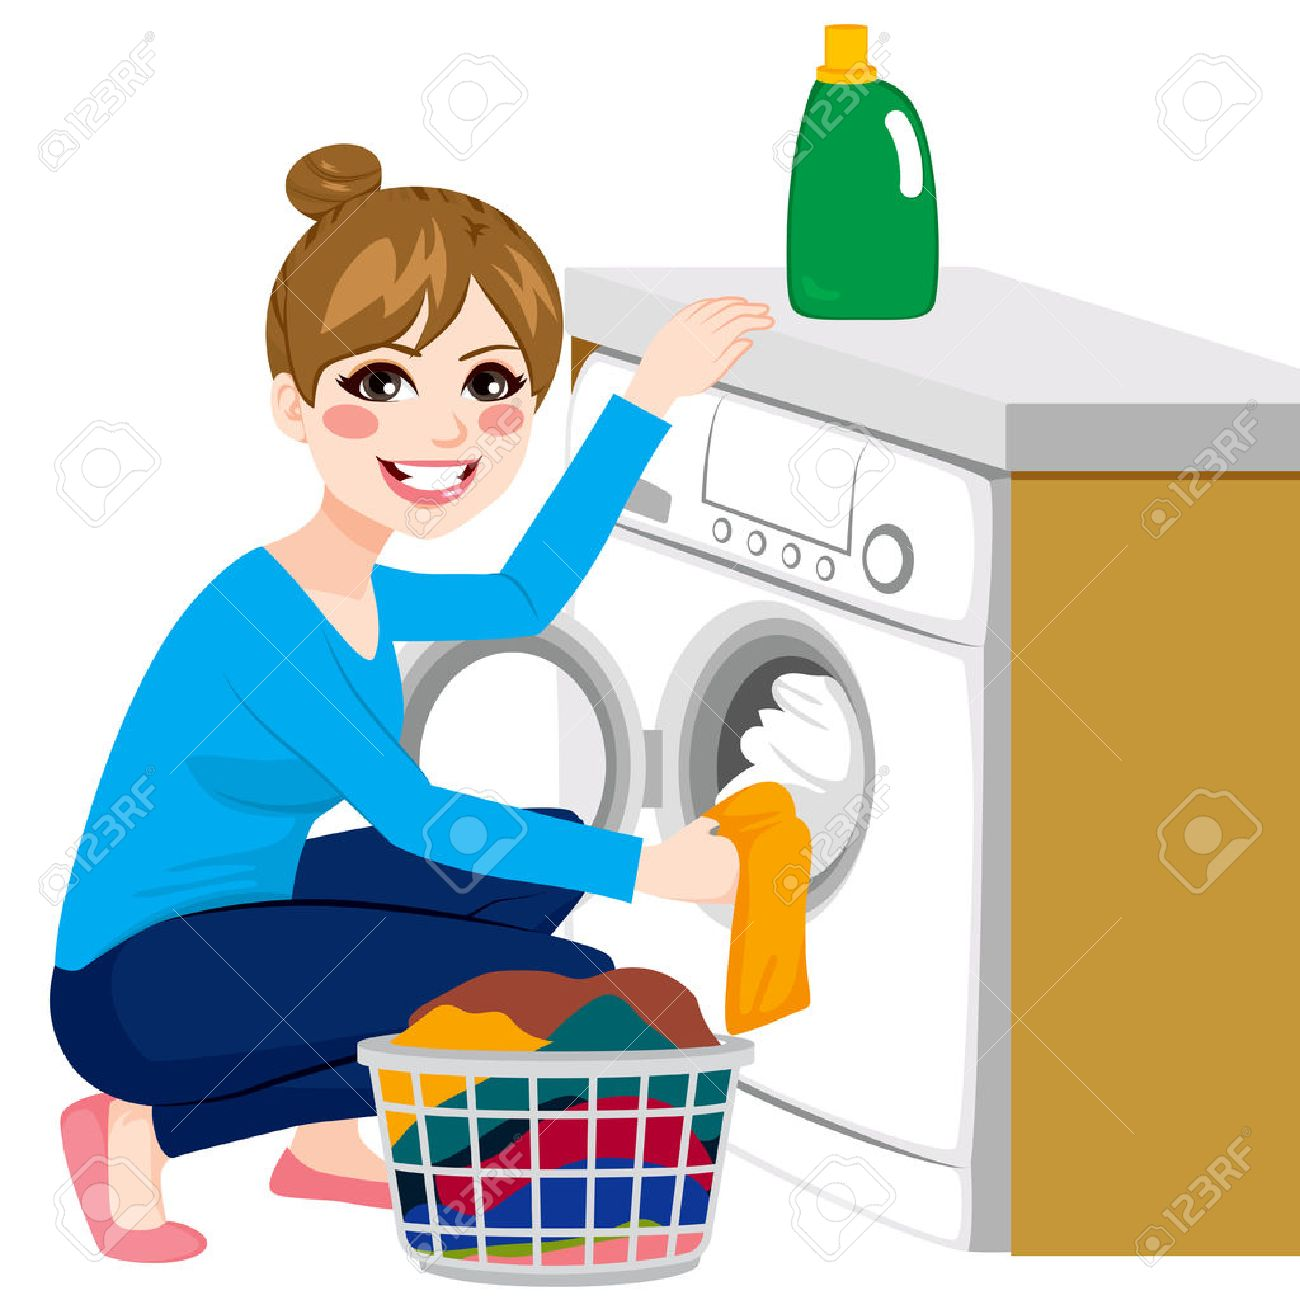 1763 Laundry free clipart.